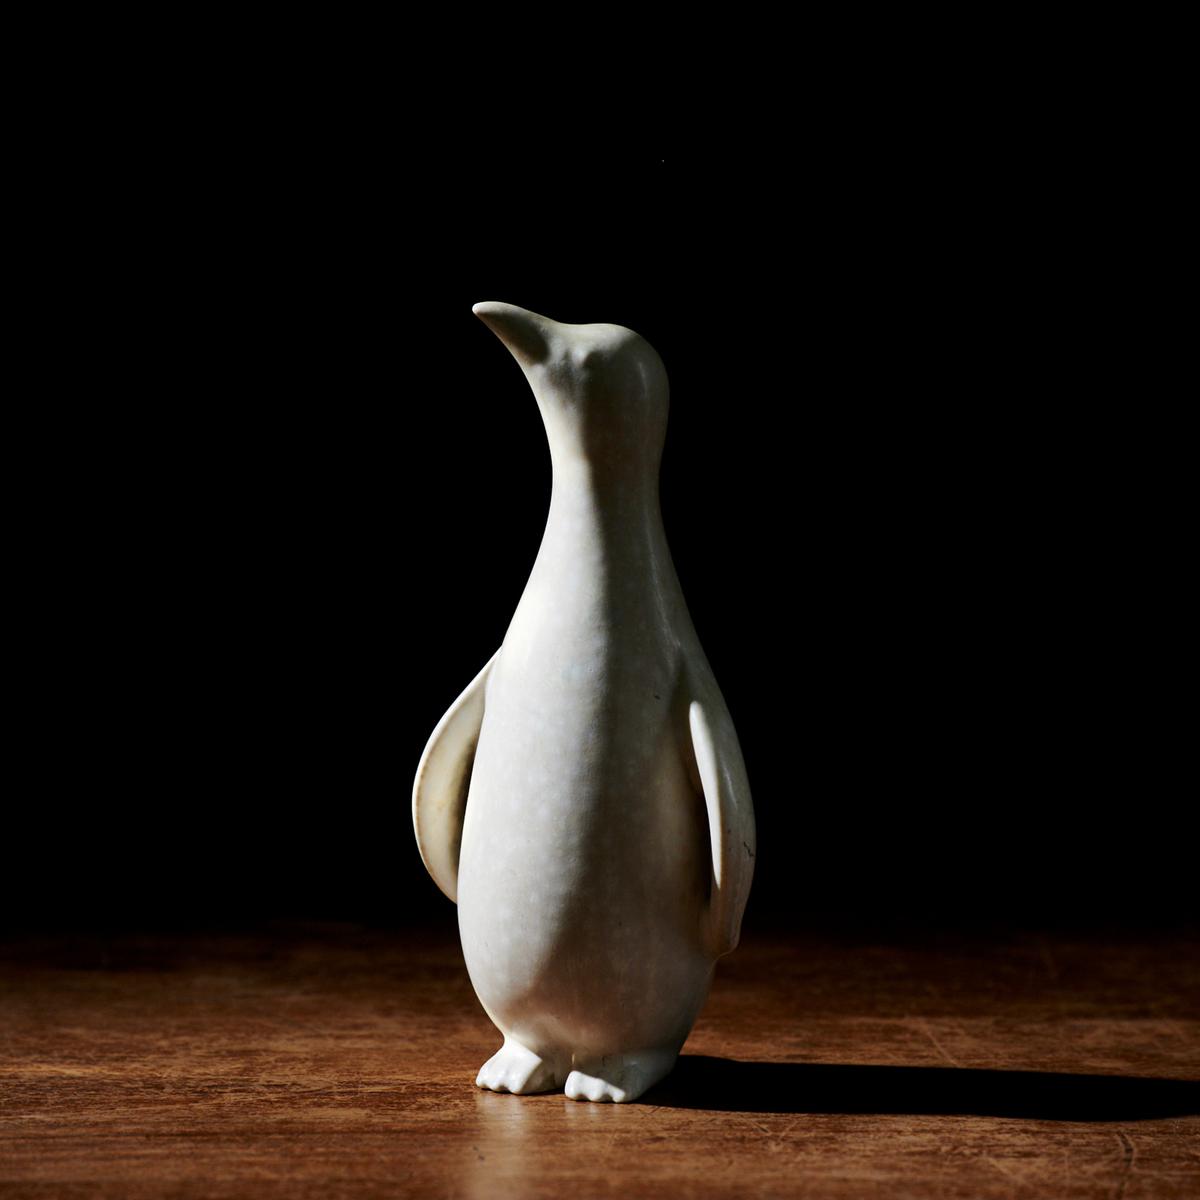 Penguin by Gunnar Nylund